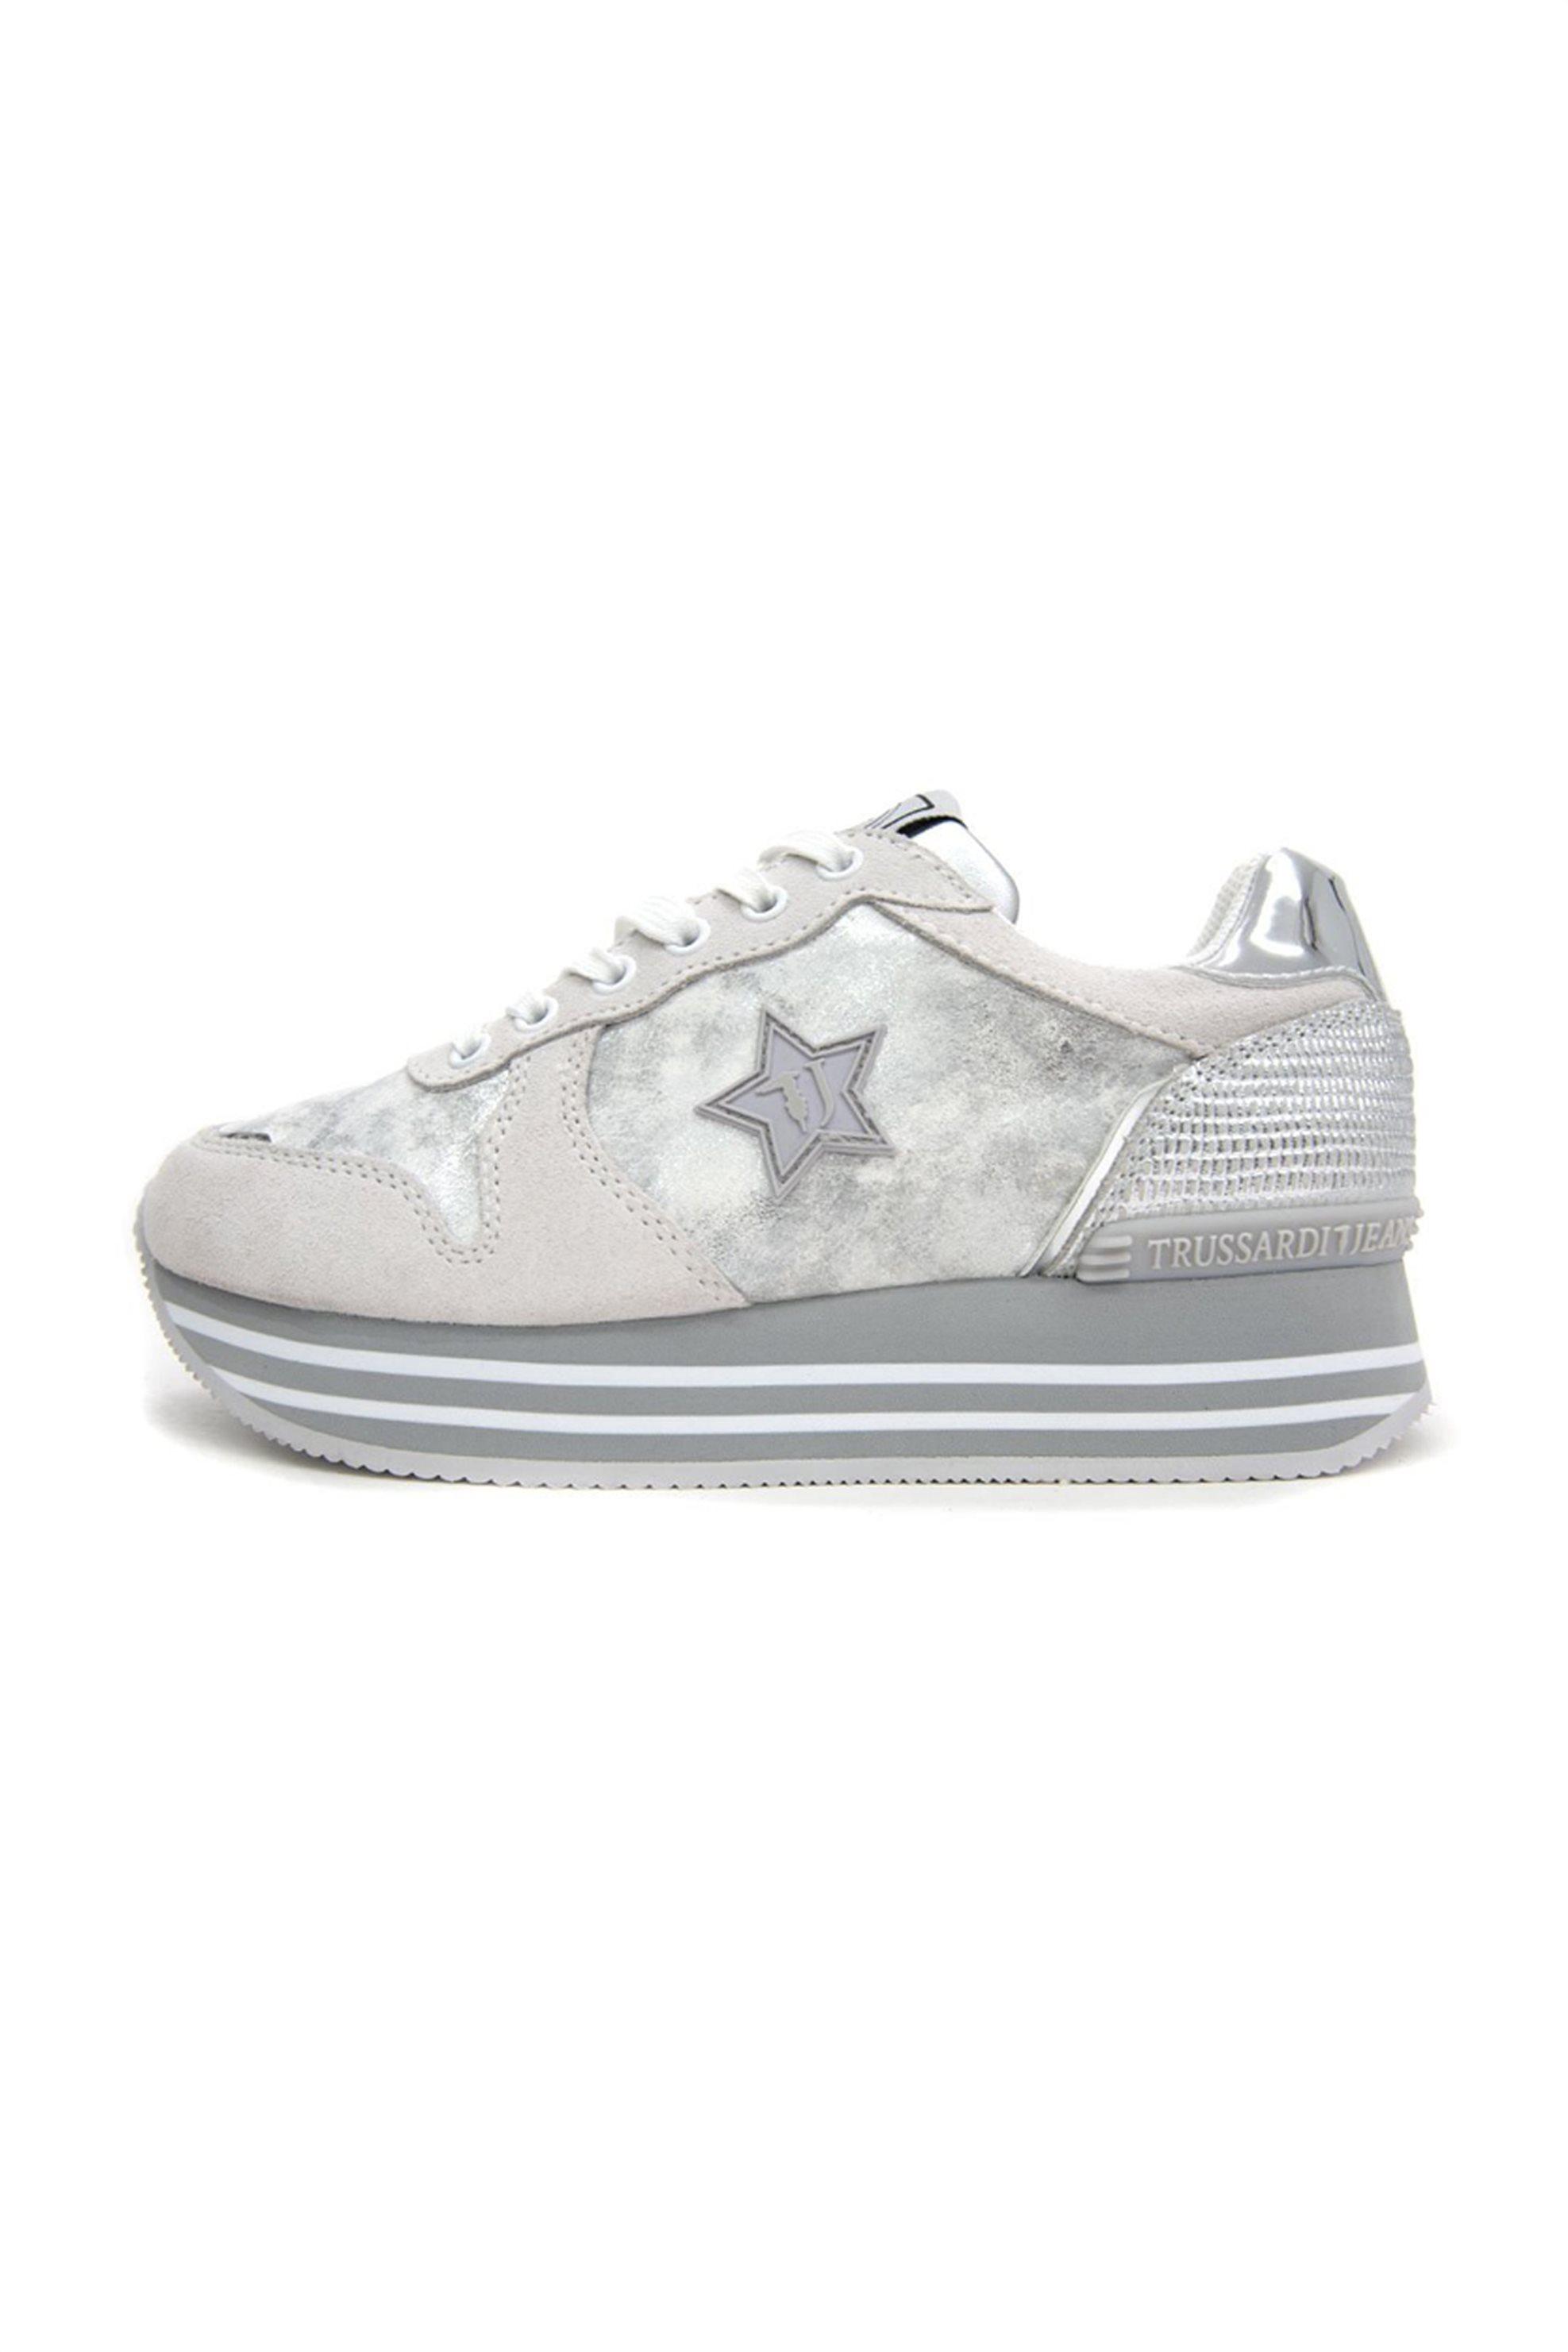 Trussardi γυναικεία sneakers με πλατφόρμα με μεταλλιζέ λεπτομέρειες – 79A00439-9Y099999 – Ασημί